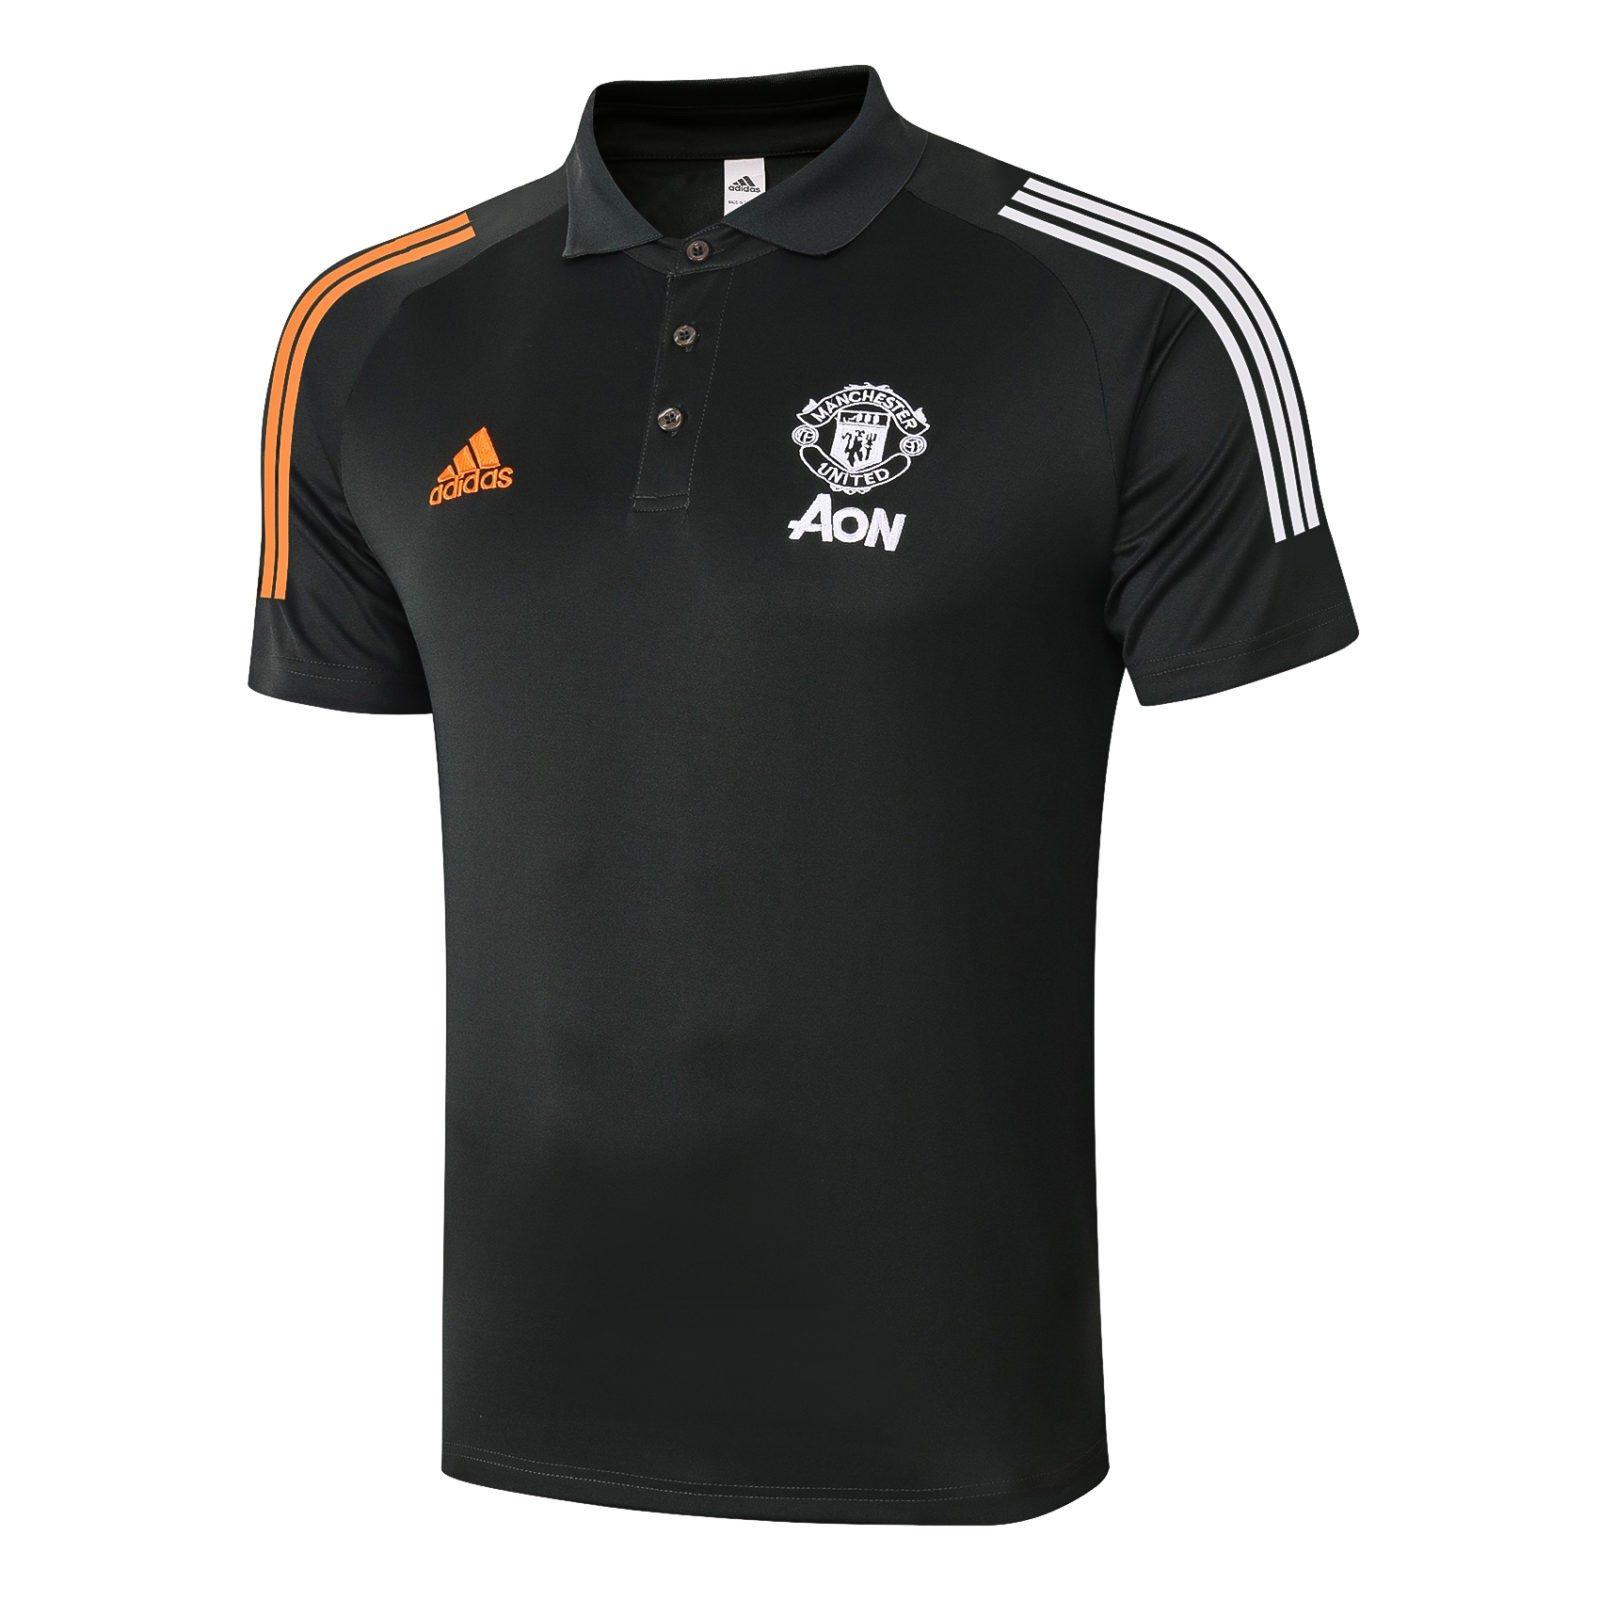 Футболка поло Манчестер Юнайтед сезон 2020-2021 (Чёрная)